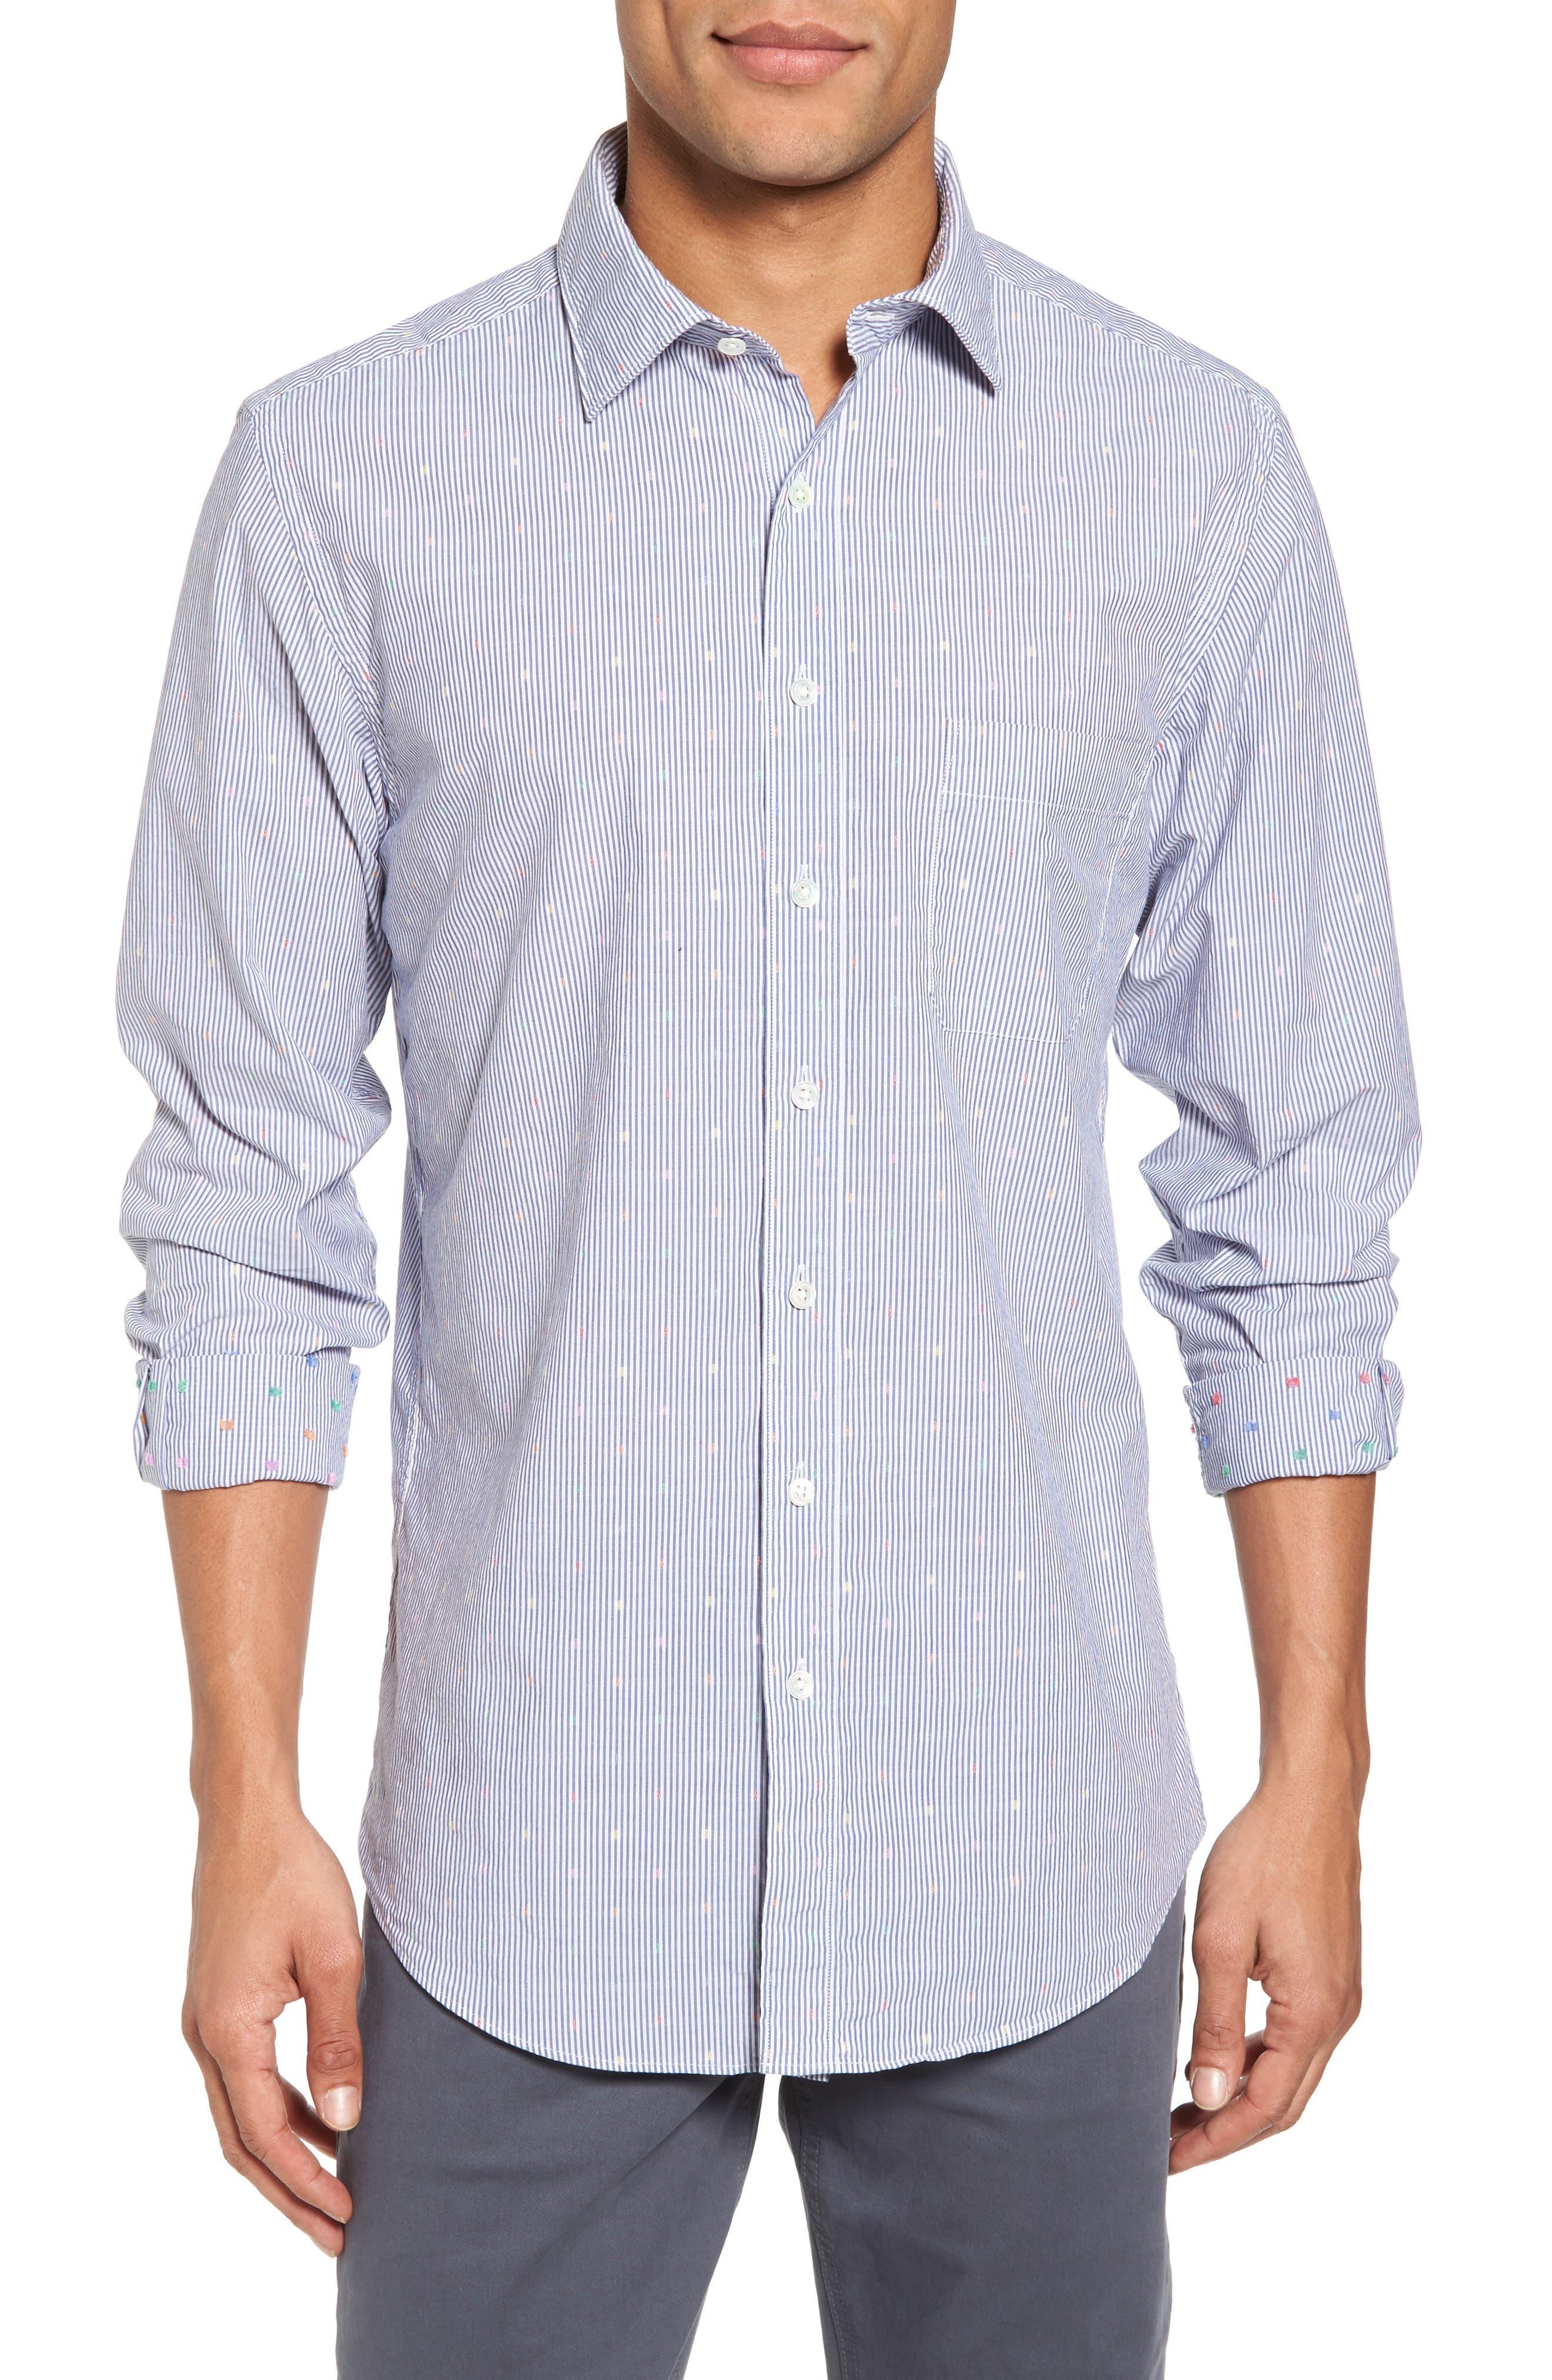 Tamaki River Woven Sport Shirt,                         Main,                         color, 423